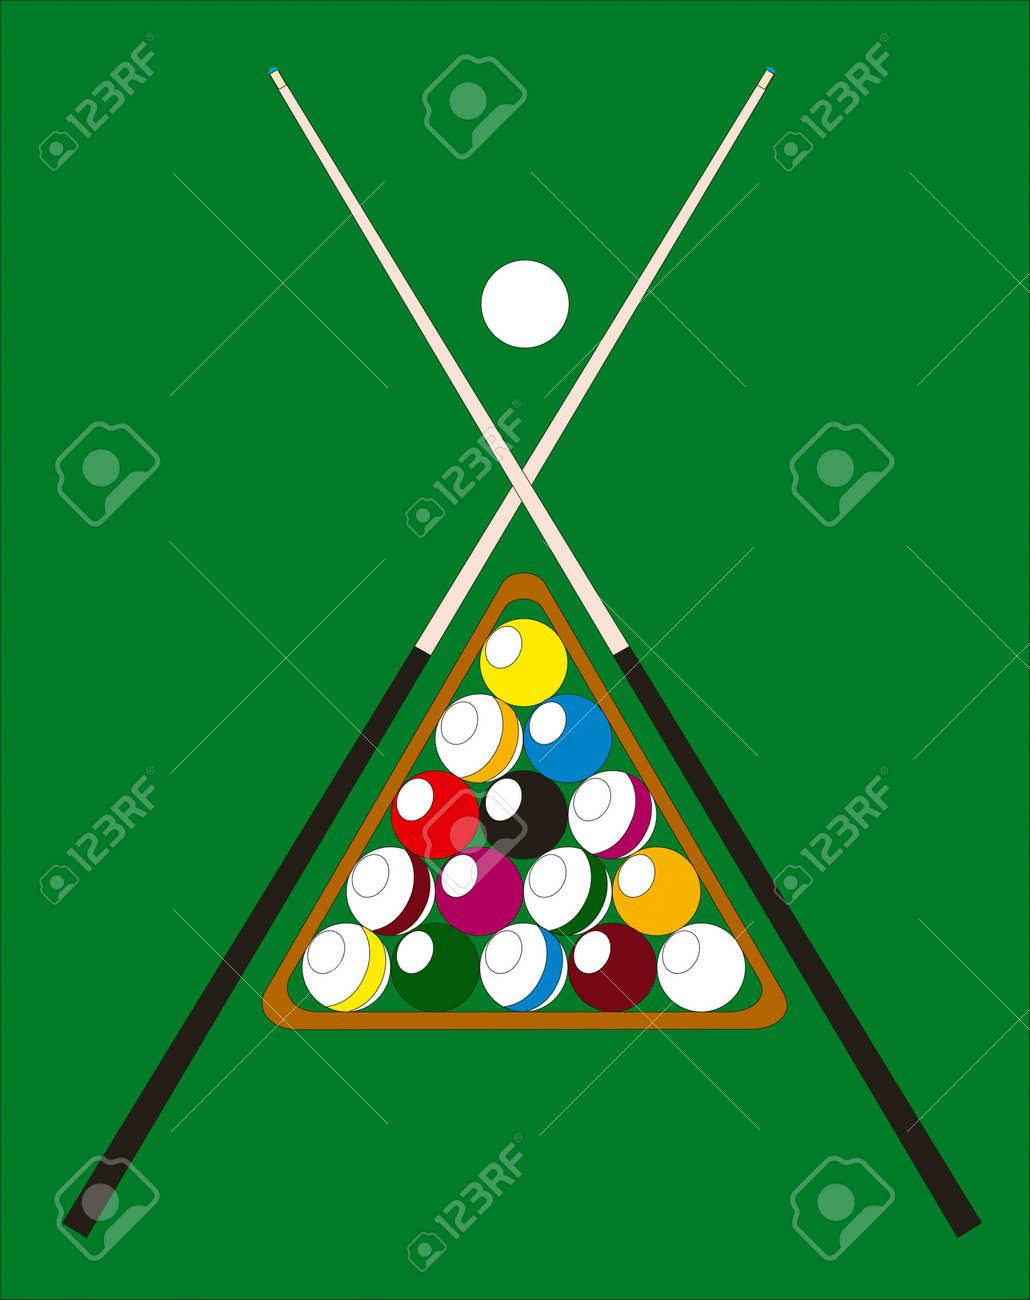 Abstract vector billiard pool illustration Stock Vector - 3578098